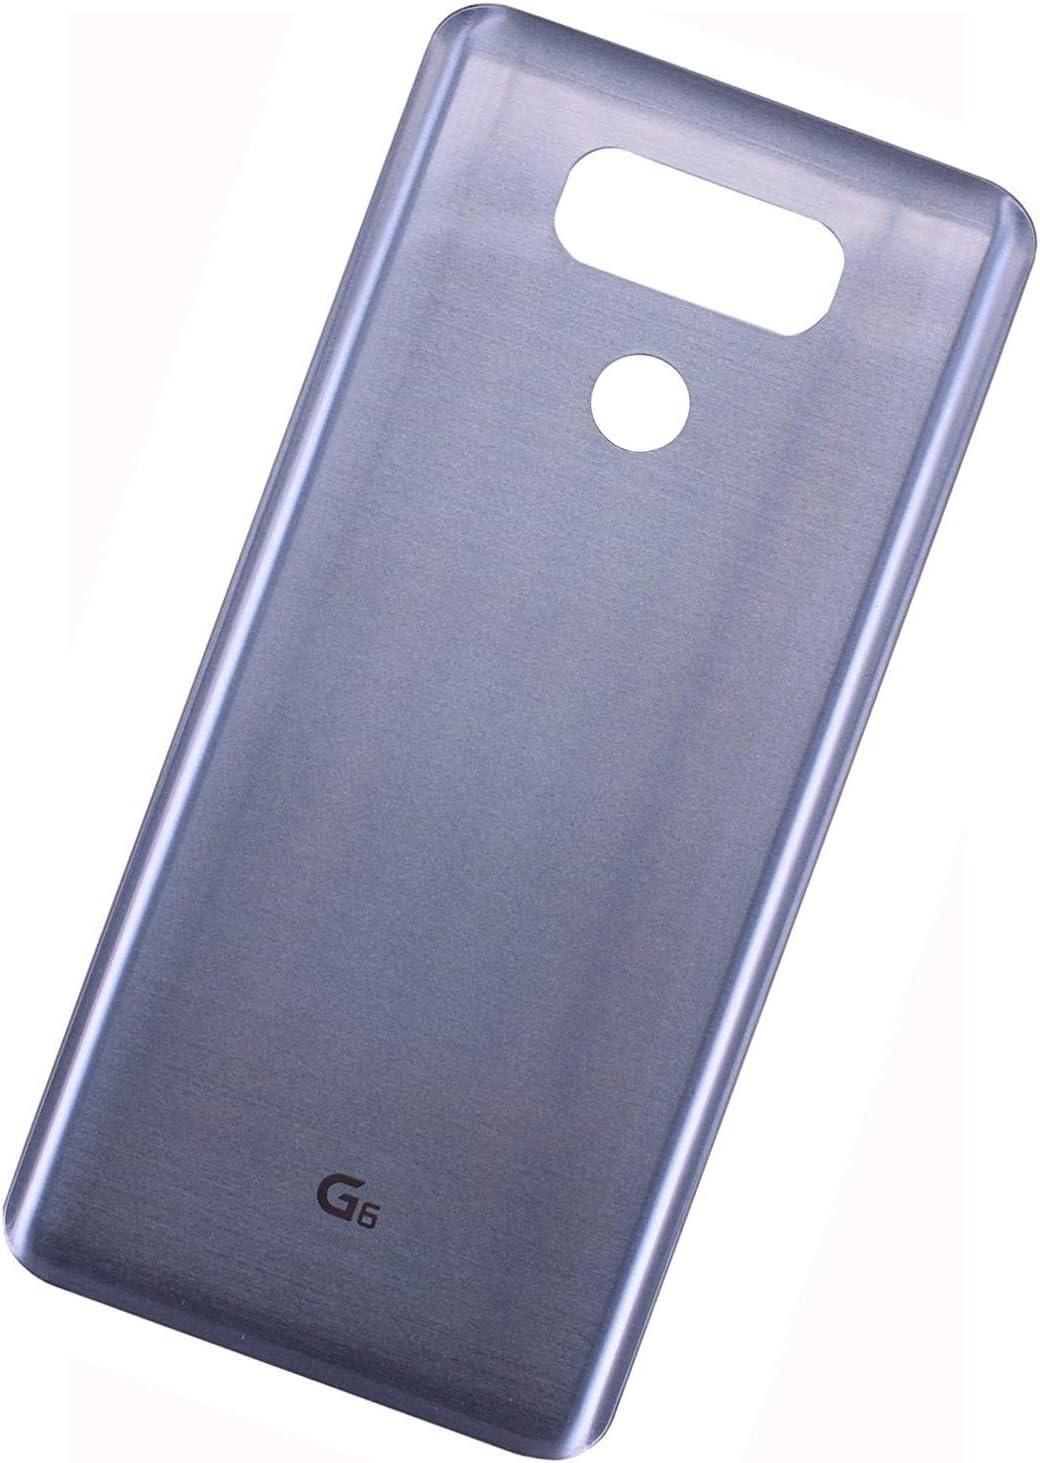 Tapa Trasera LG G6 H870 LS993 H872 H871 VS988 Platinum Ice